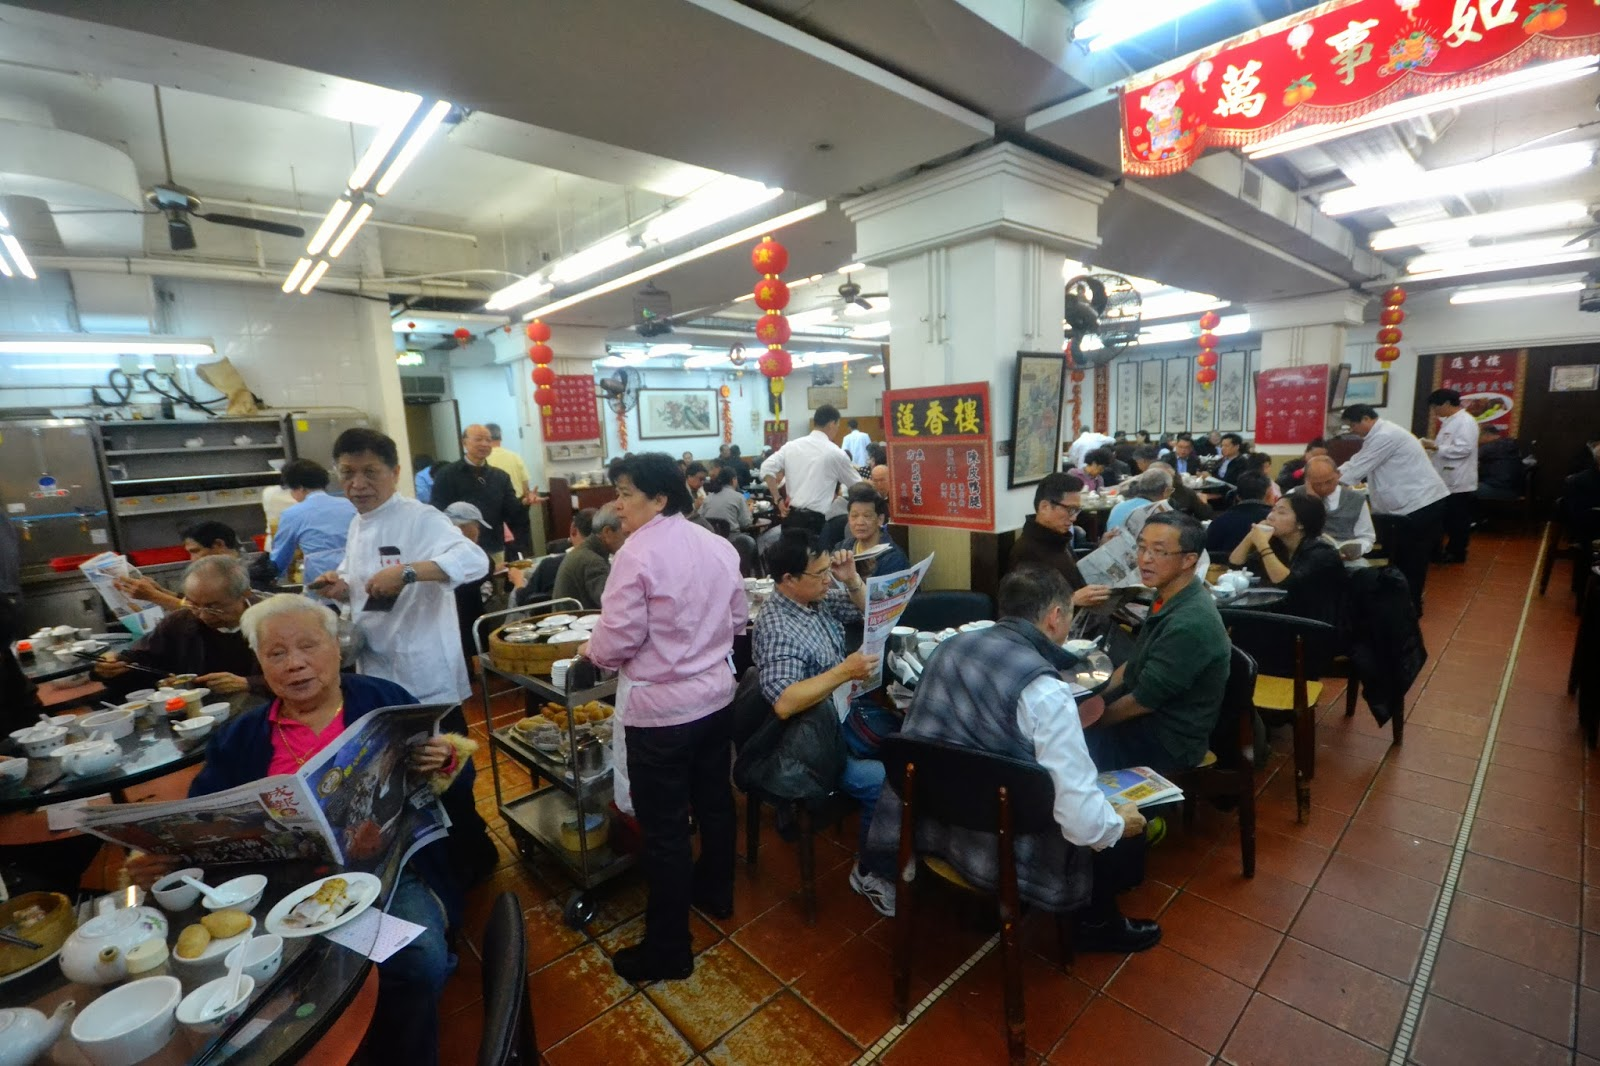 Lin Heung Teahouse